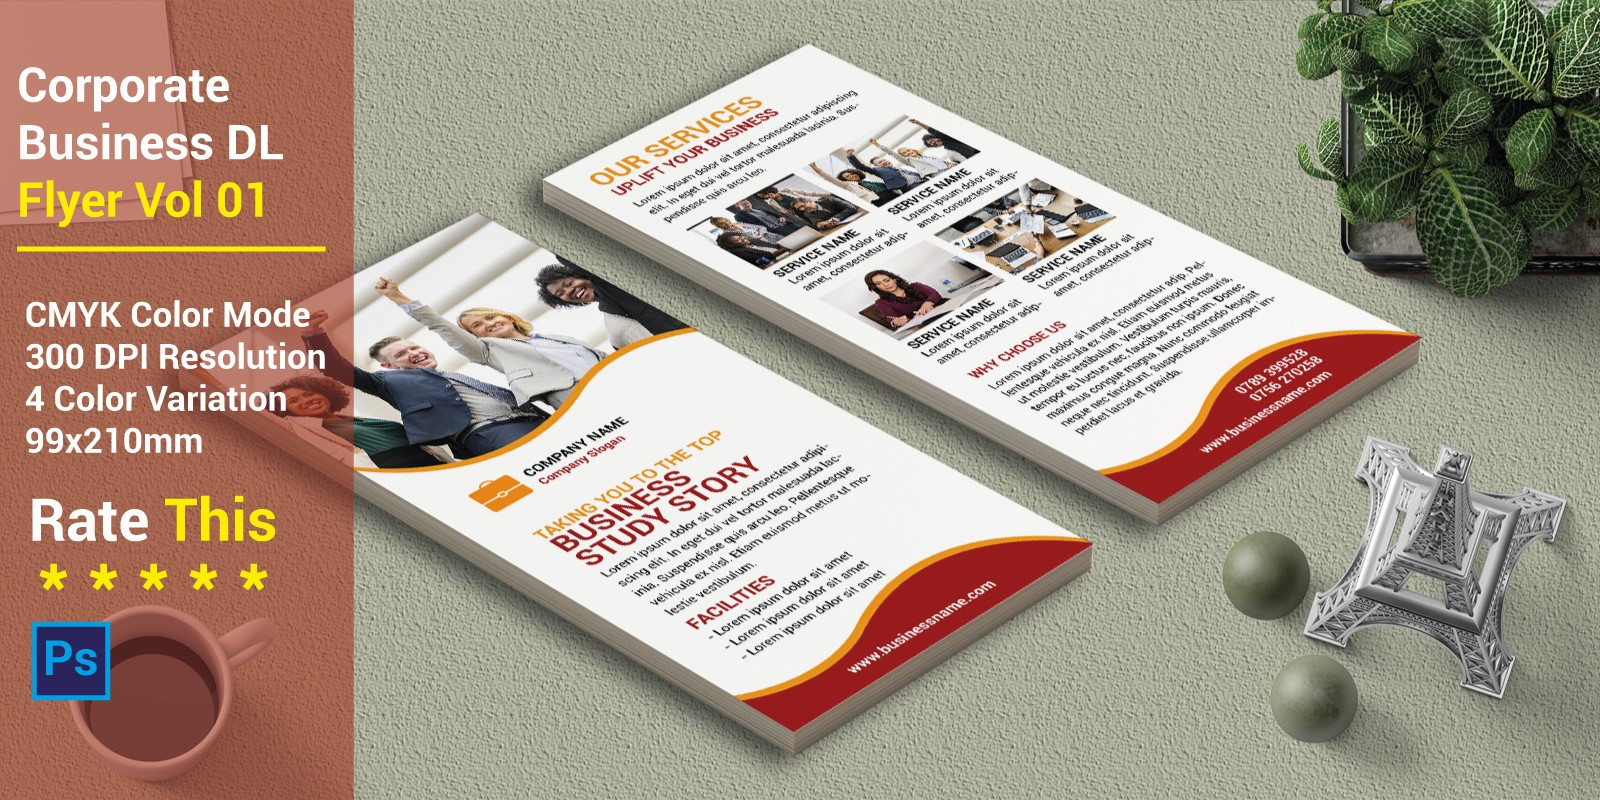 Corporate Business DL Flyer Vol 01